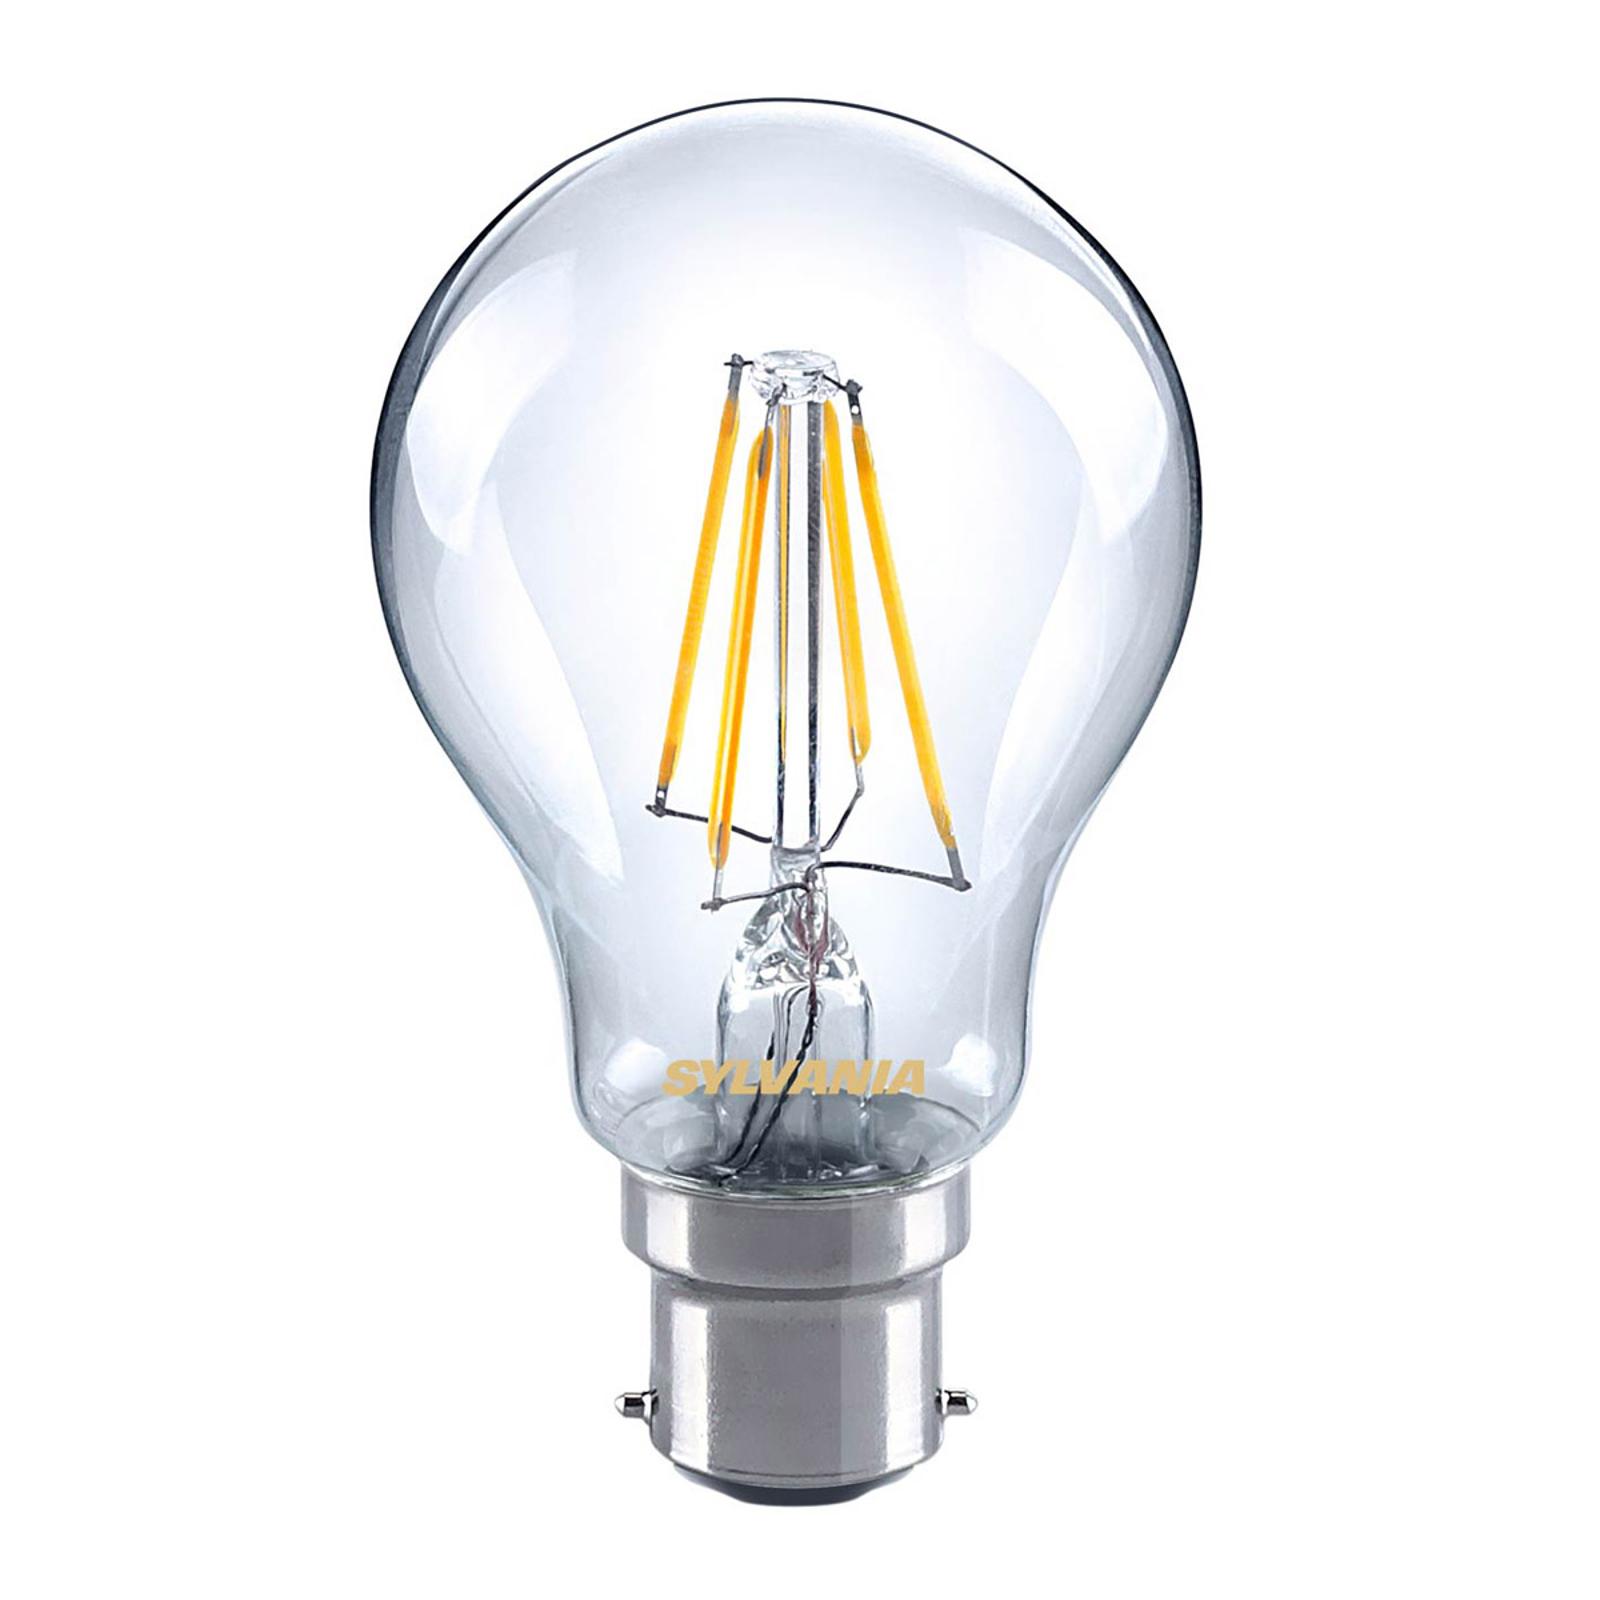 LED-Lampe B22 A60 Filament 4,5W 827, klar